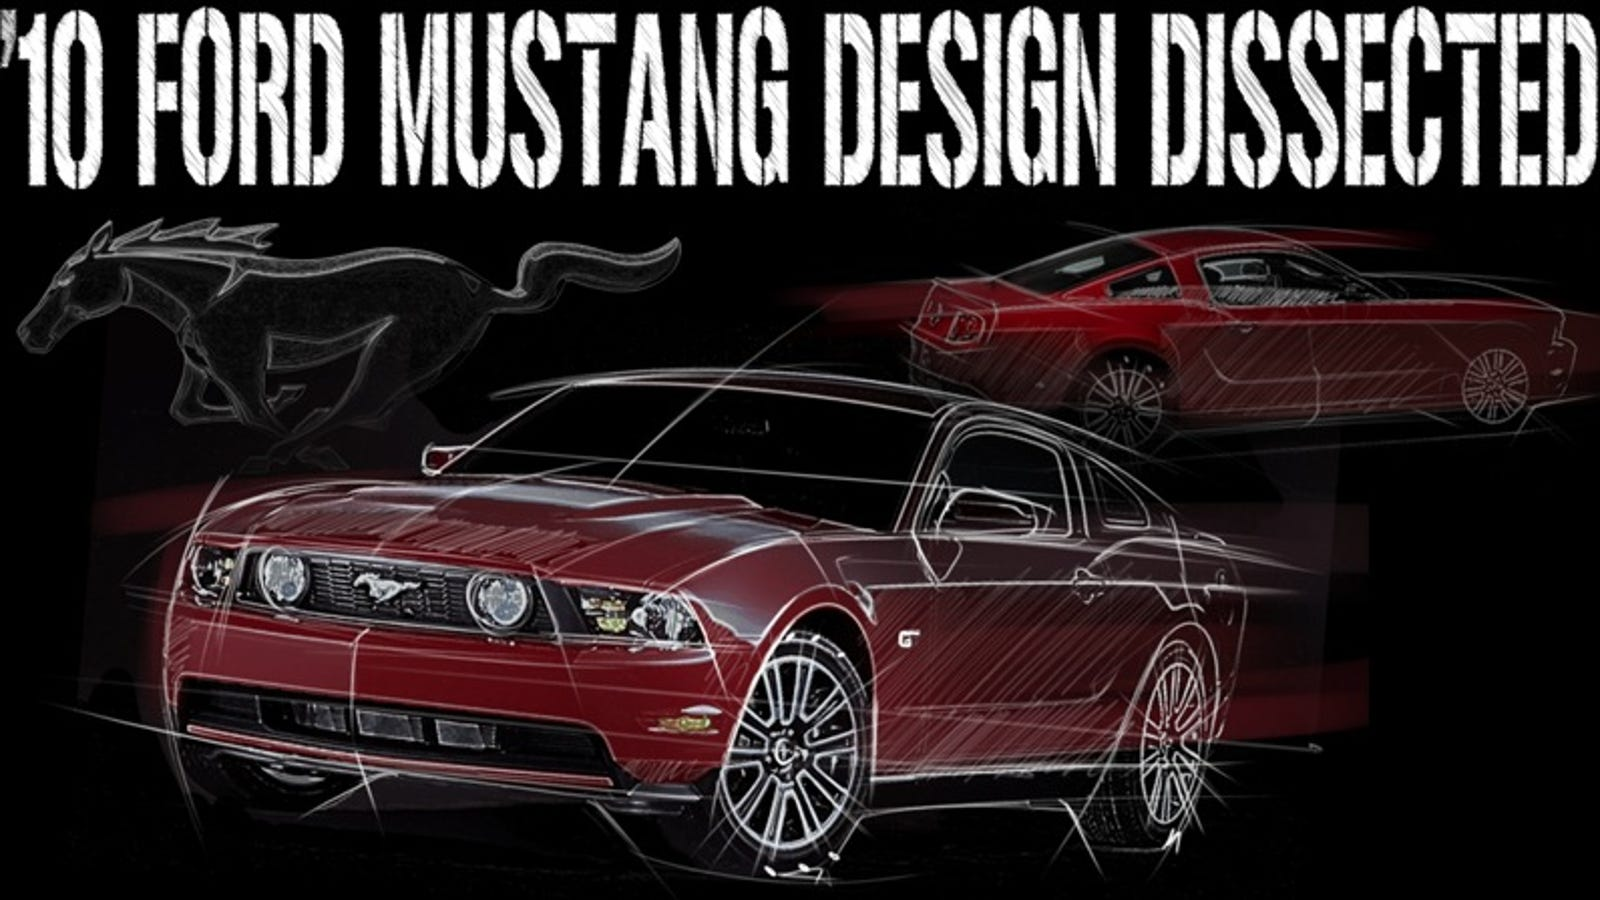 2010 ford mustang design dissected. Black Bedroom Furniture Sets. Home Design Ideas